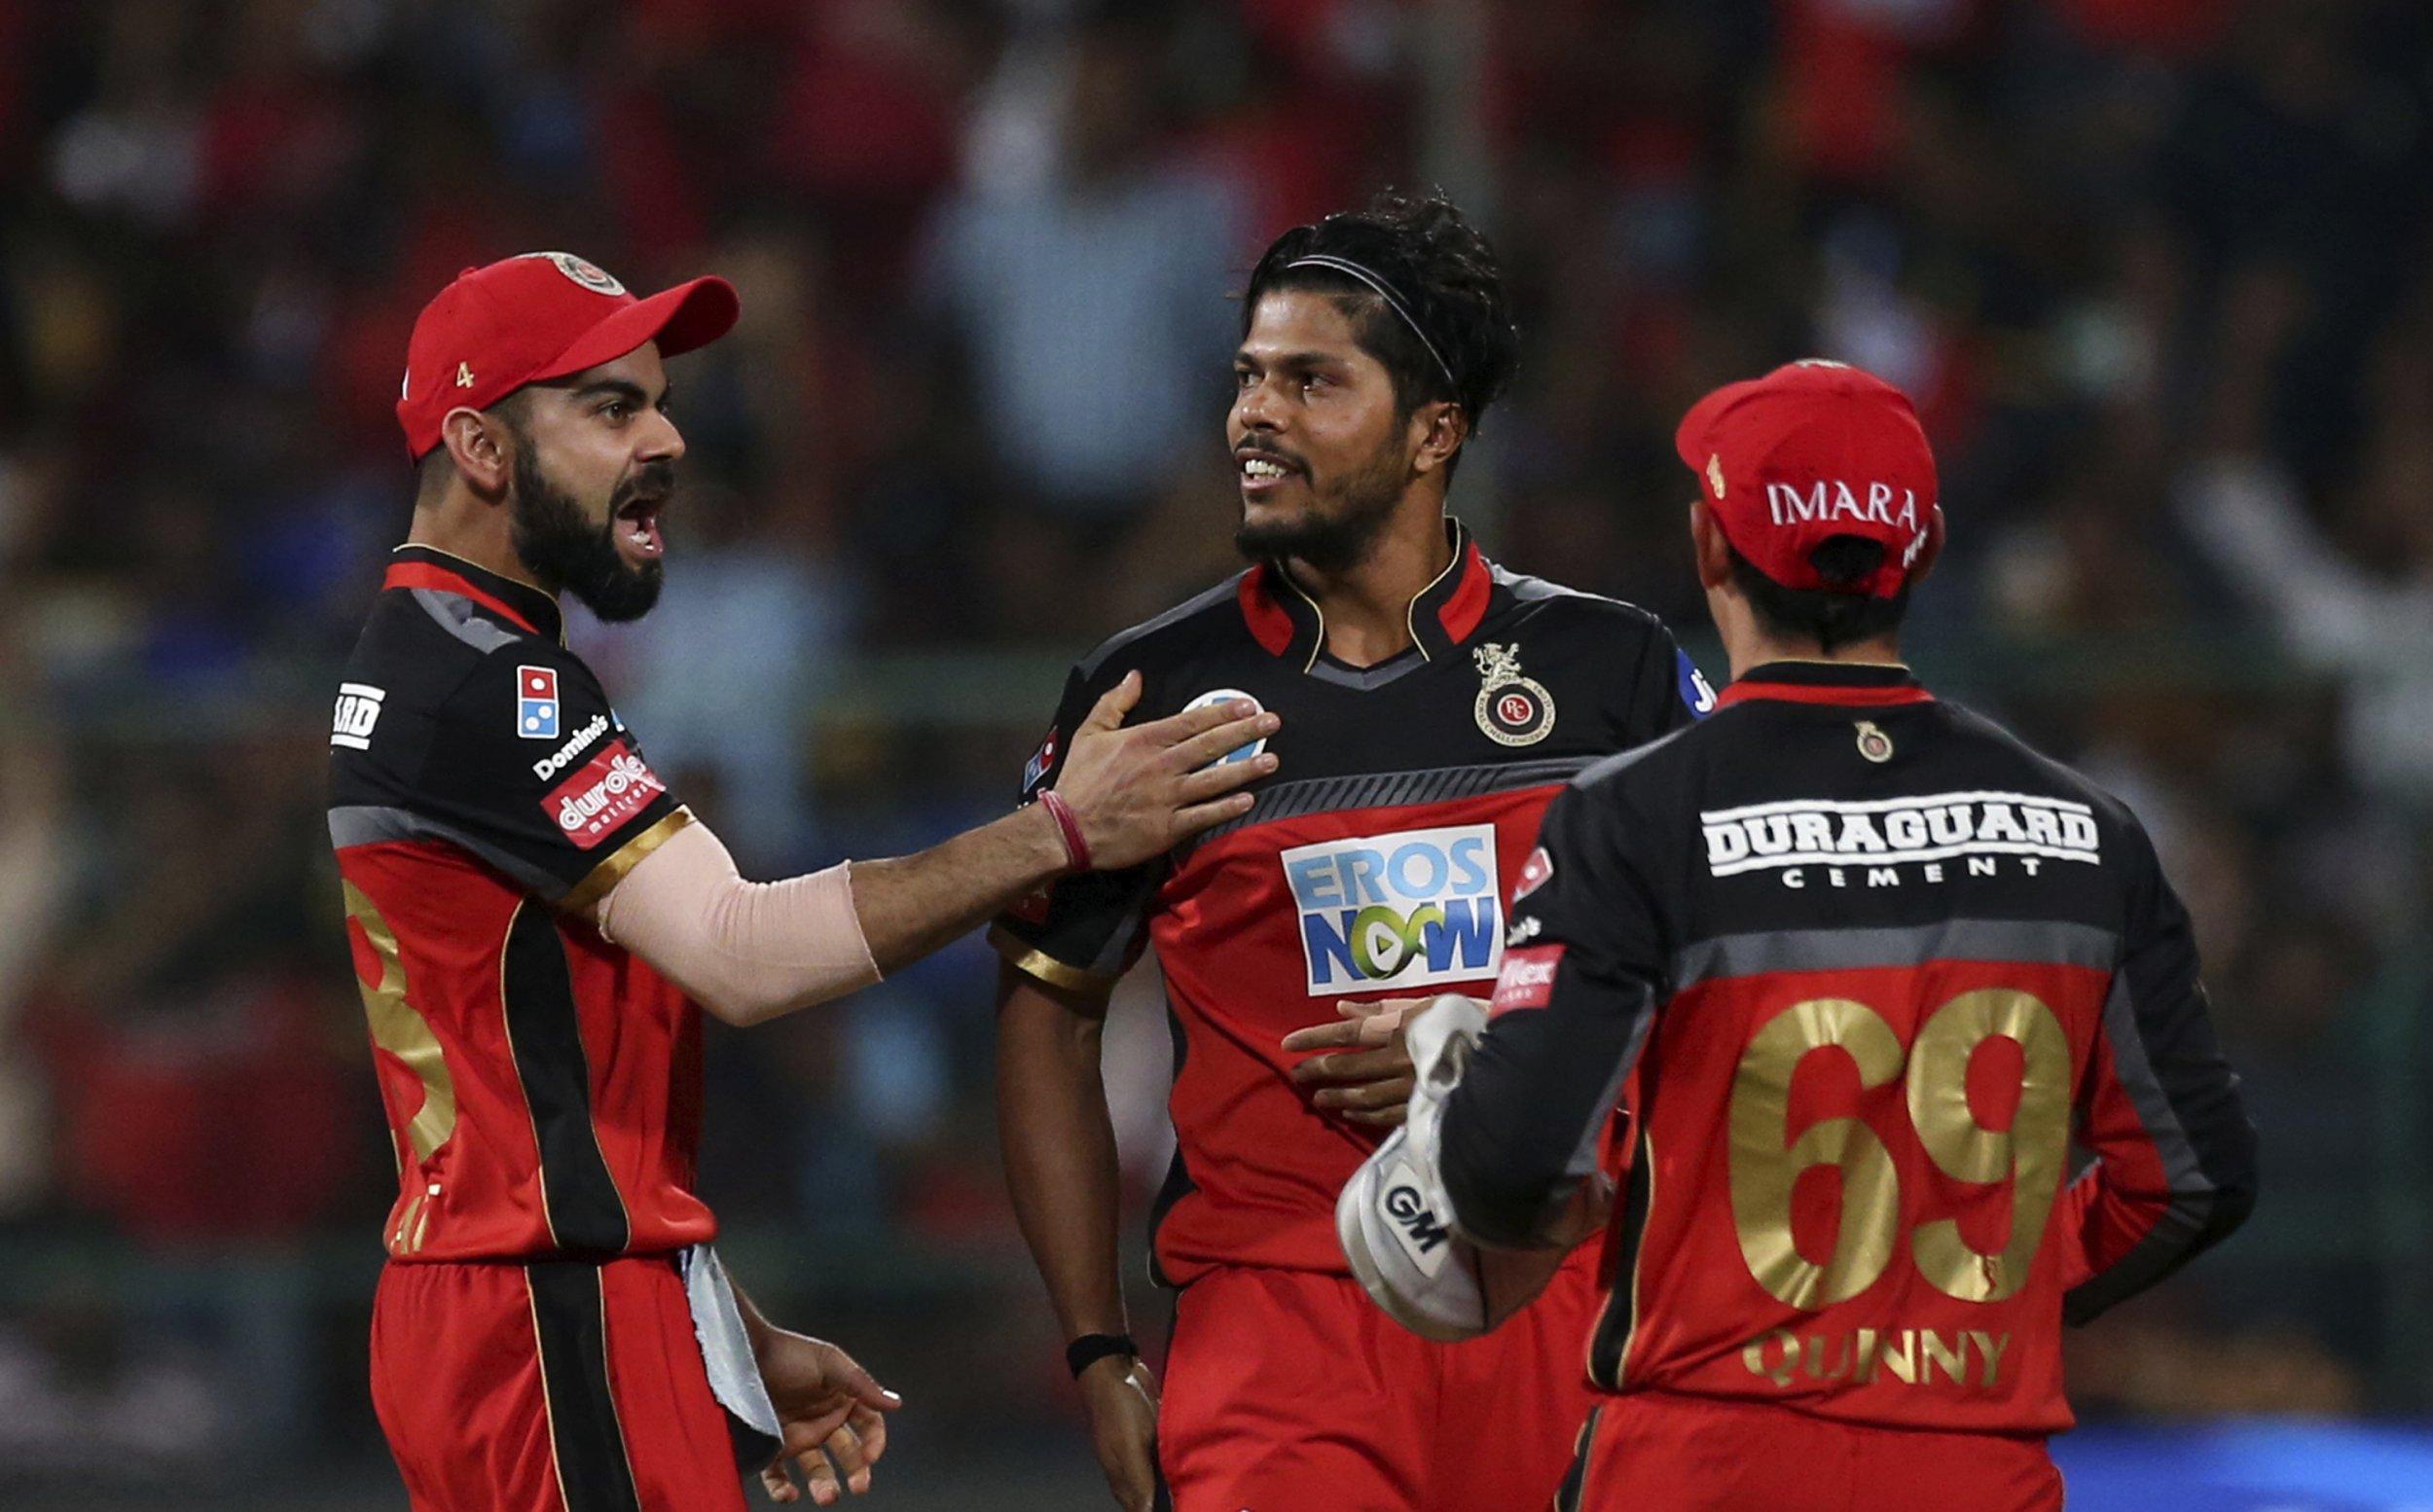 Royal Challengers Bangalore v Sunrisers Hyderabad betting preview: IPL stars Umesh Yadav and Kane Williamson expected to shine